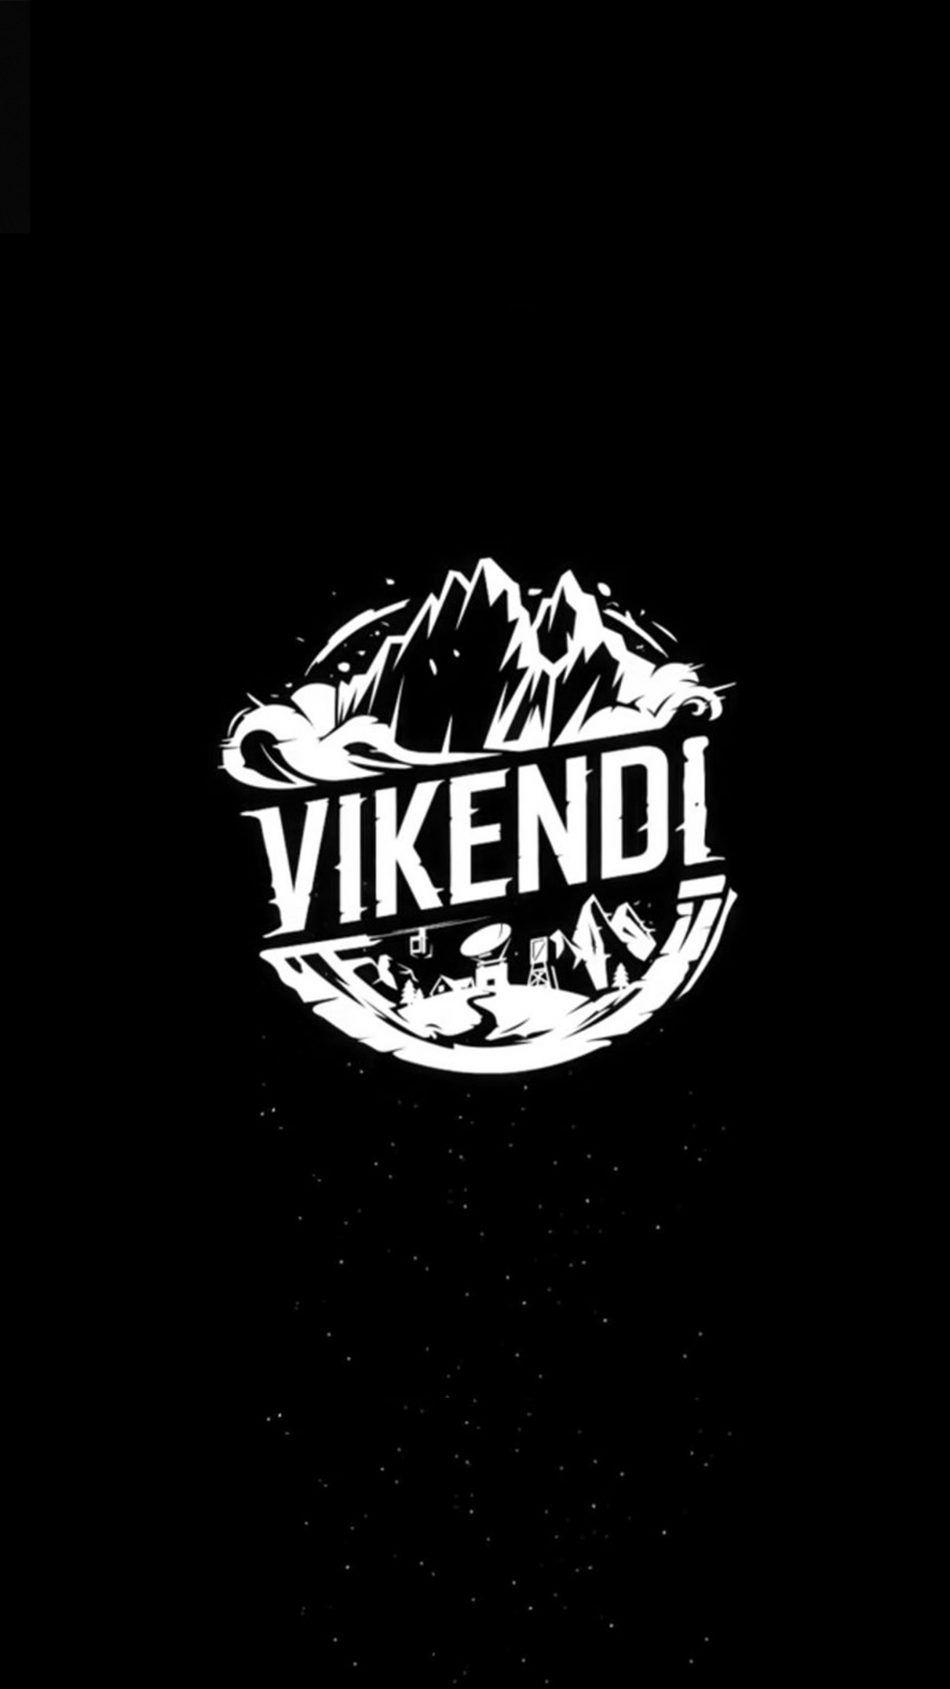 Vikendi Playerunknown S Battlegrounds 4k Ultra Hd Mobile Wallpaper